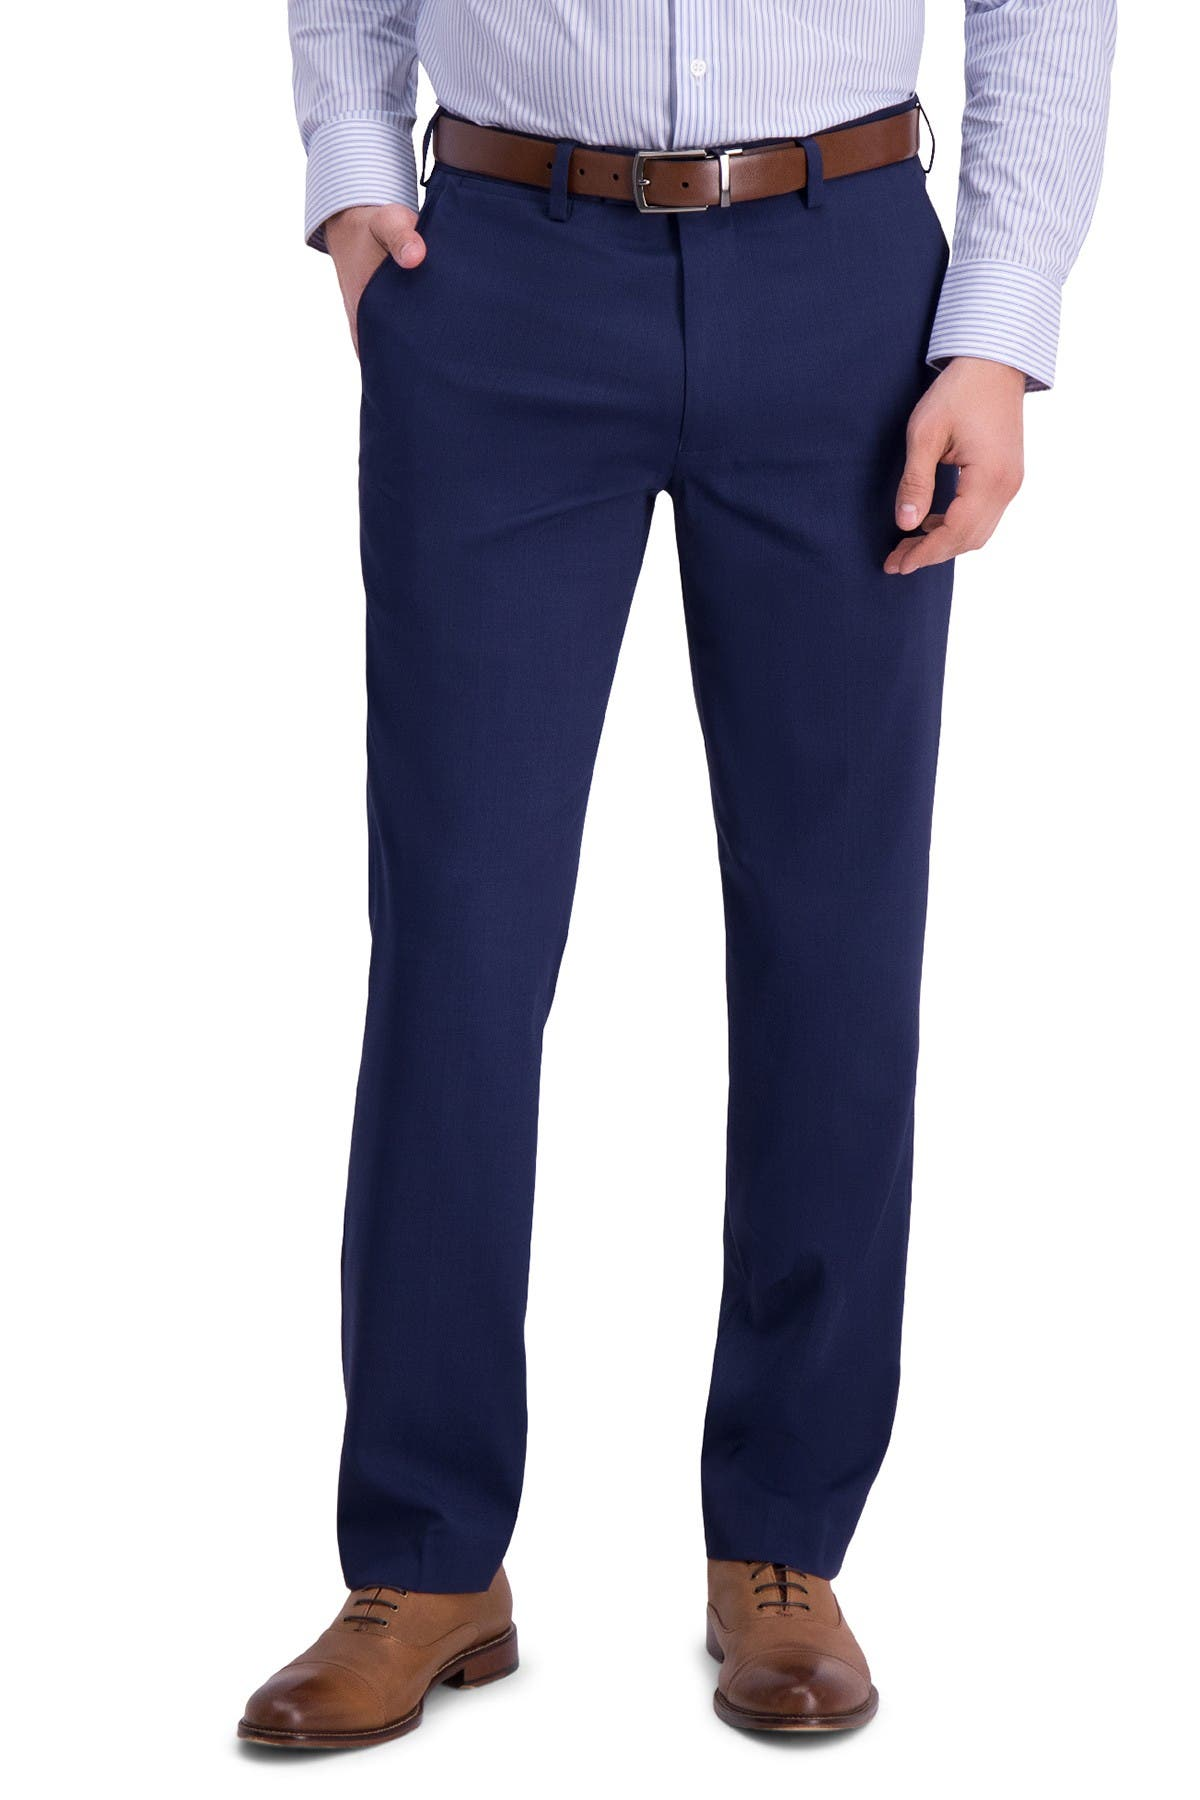 Image of Louis Raphael Micro Stripe Flat Front Slim Fit Dress Pants